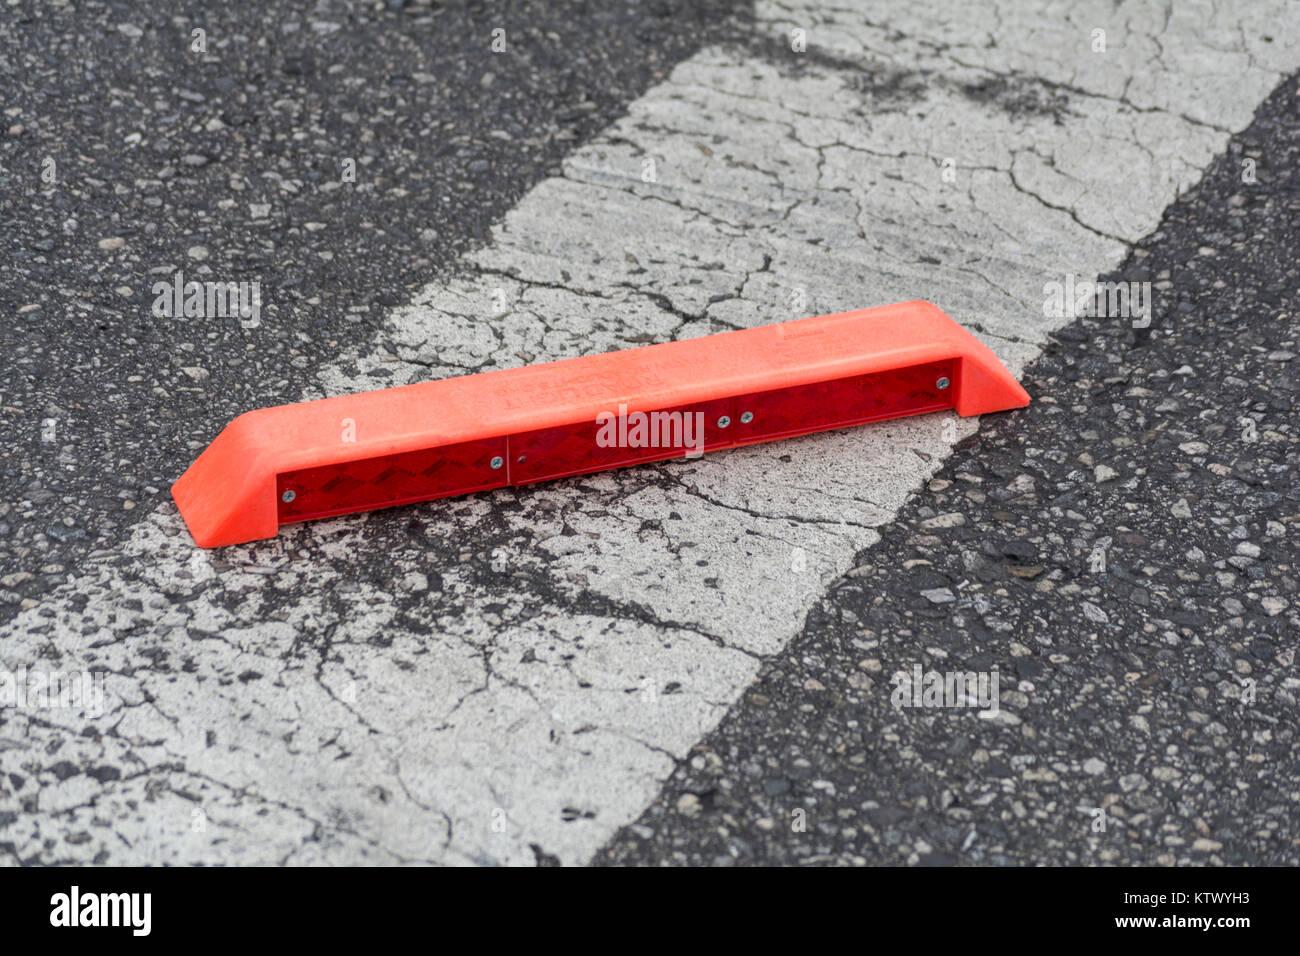 Accident Southern Blvd Royal Palm Beach Fl